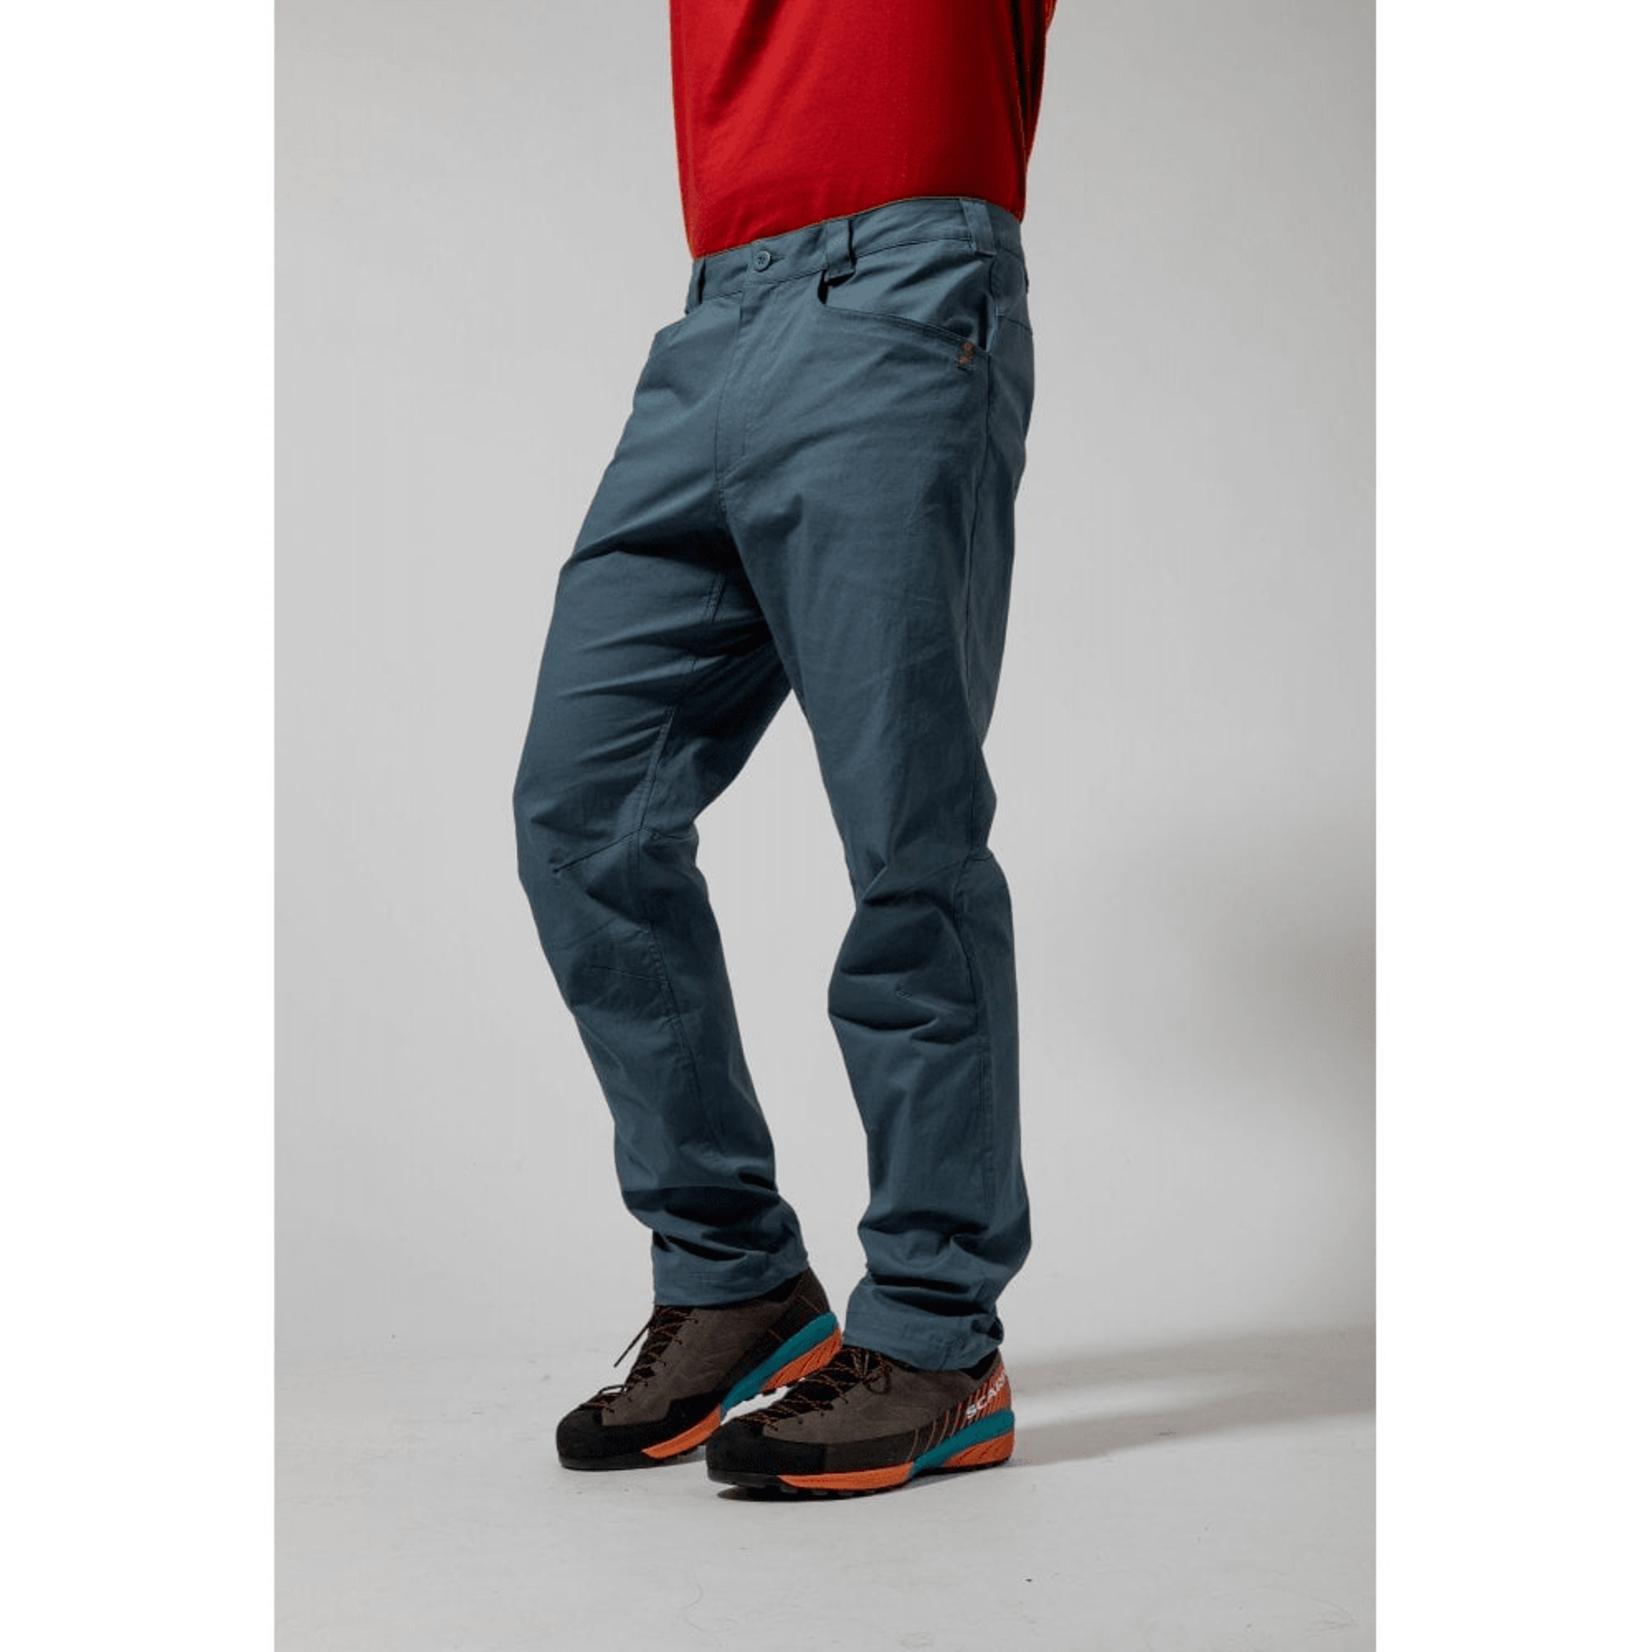 Montane Men's On-Sight Pants